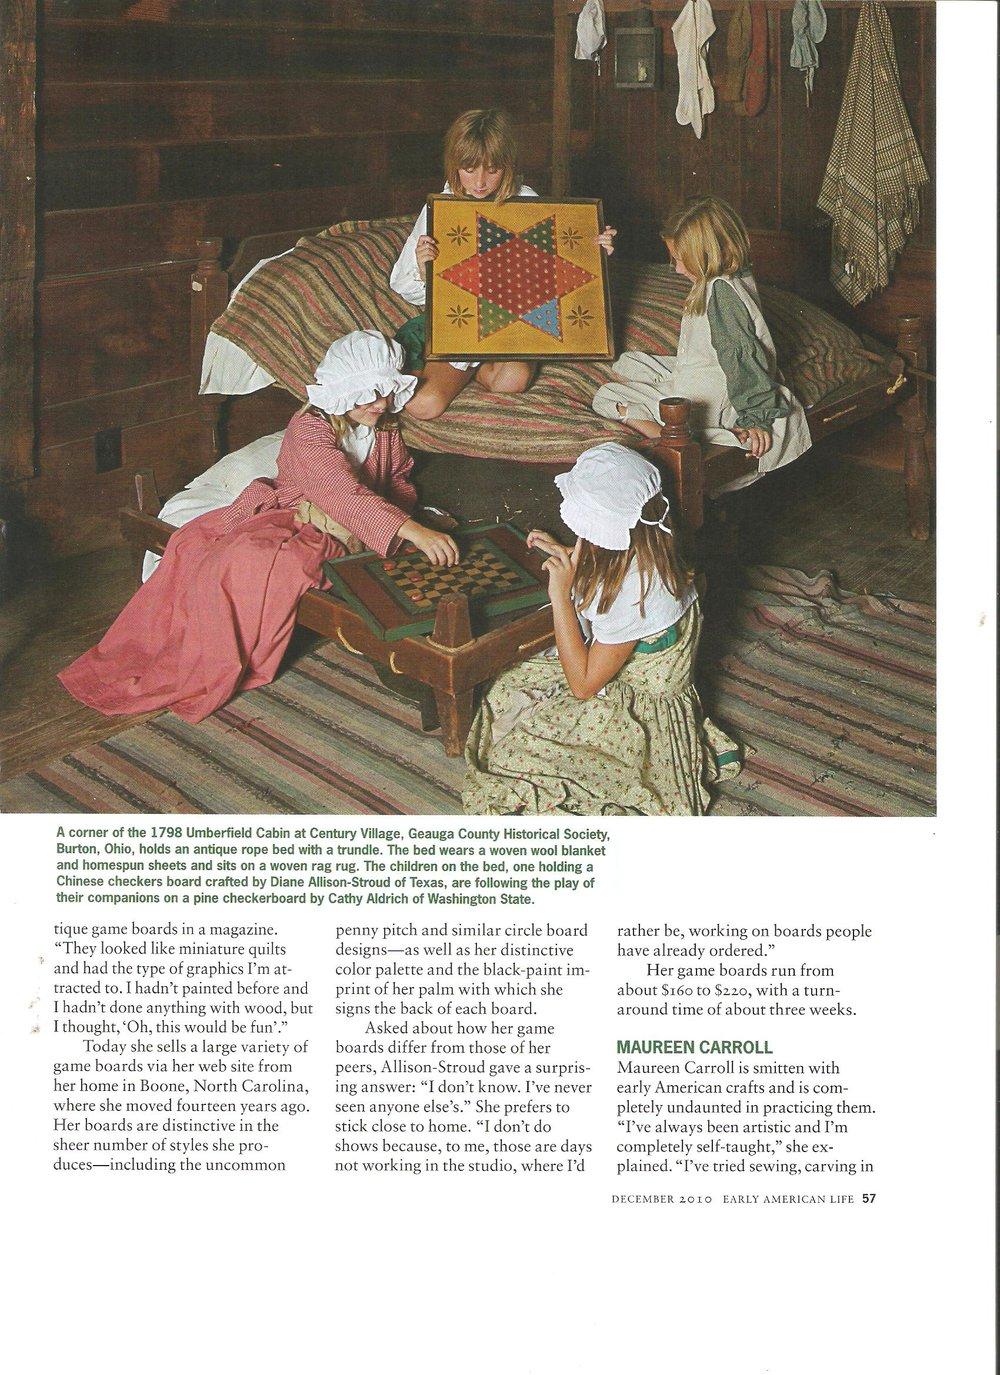 Early American Life Magazine 002.jpg